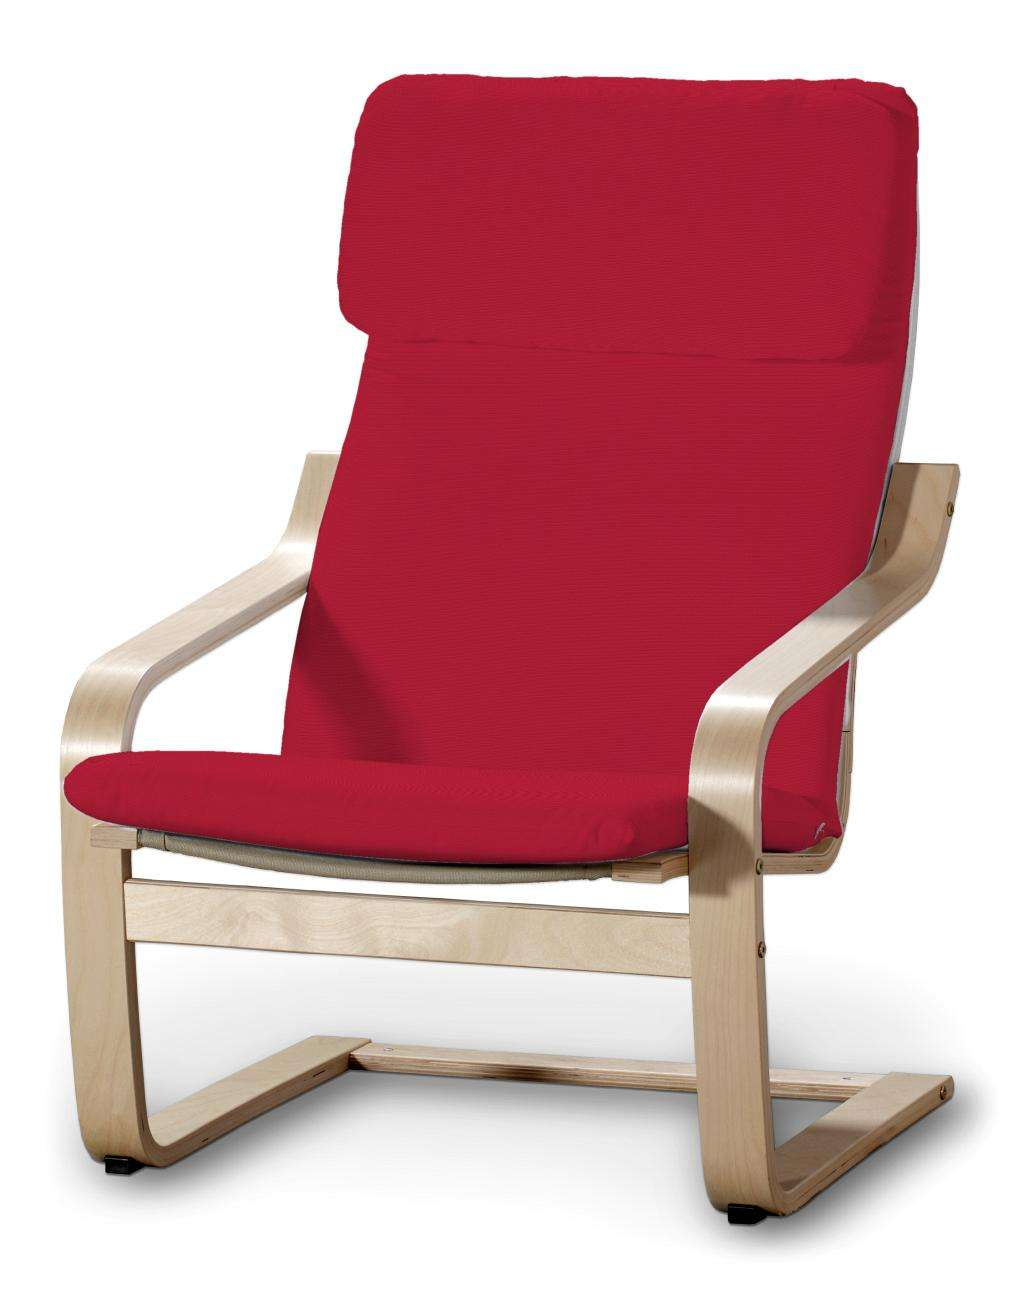 Poäng Sesselbezug I, rot, Sessel Poäng, Cotton Panama